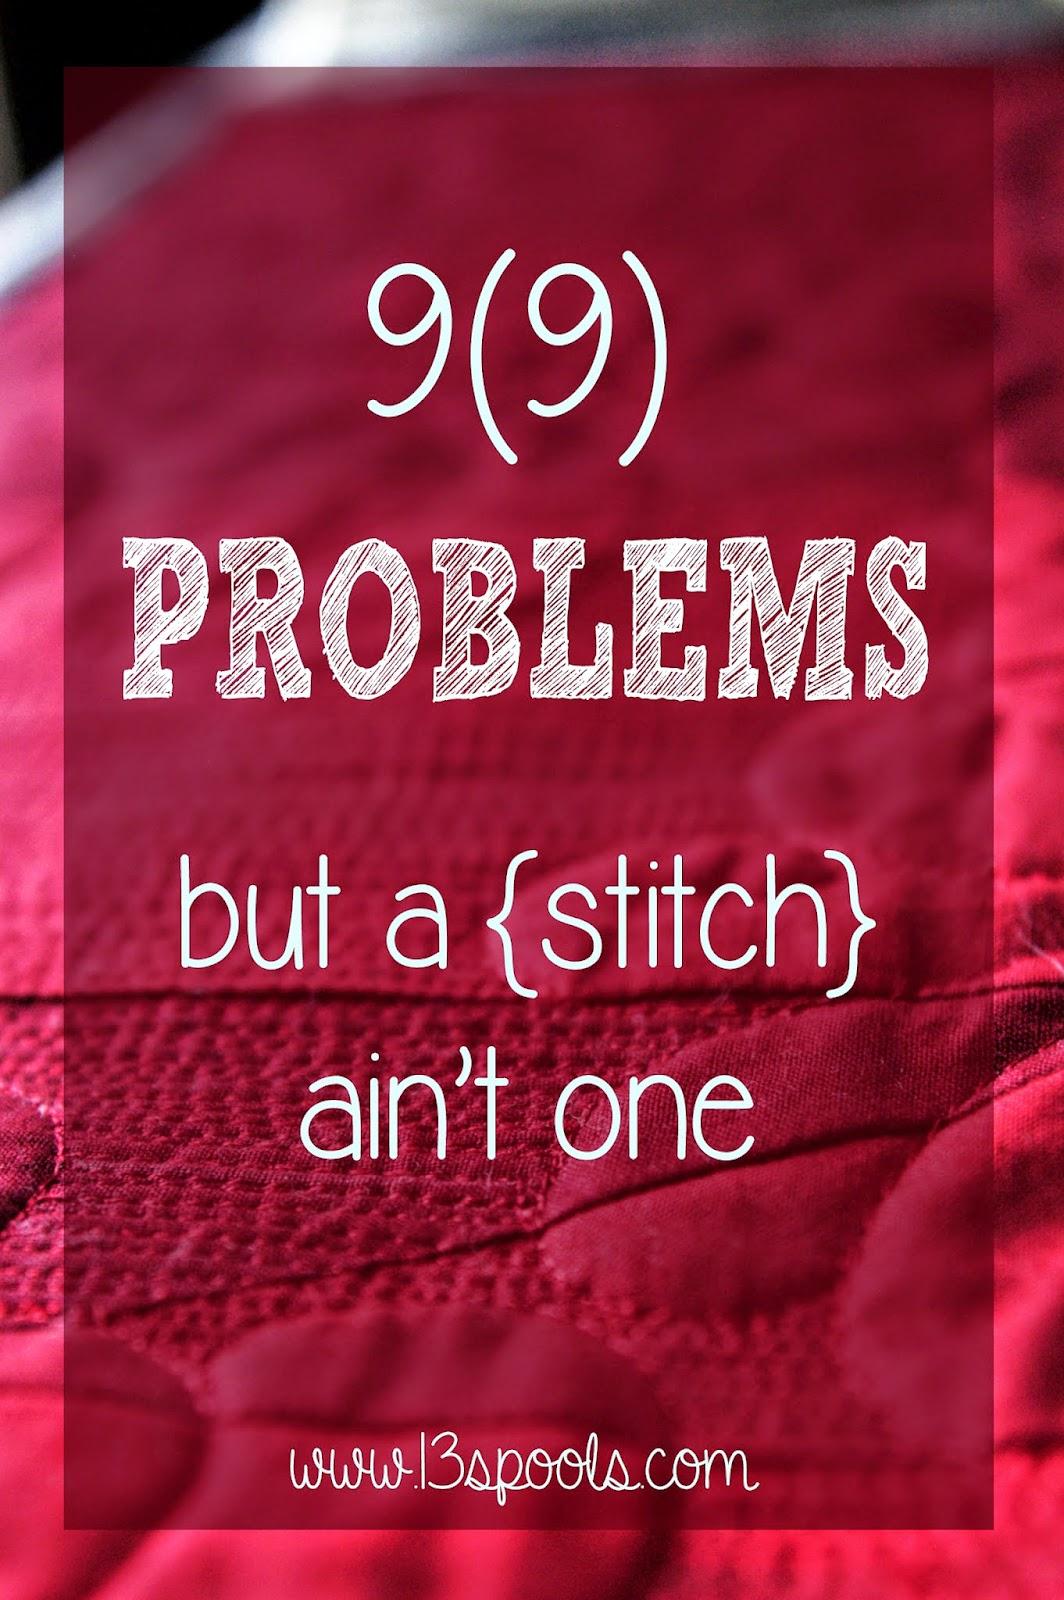 9(9) Problems... but a Stitch ain't one